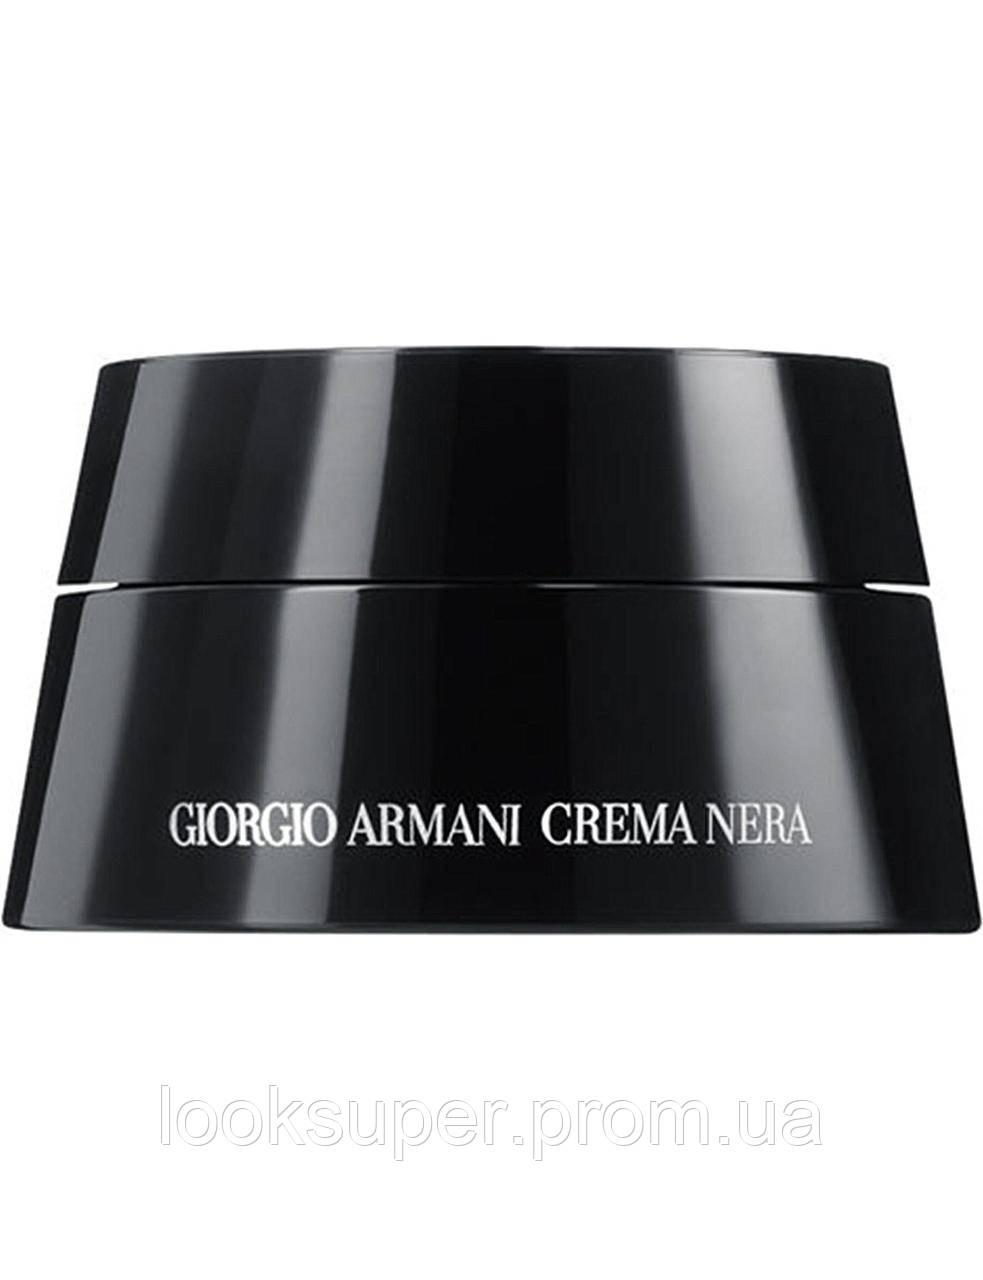 Крем GIORGIO ARMANI Crema Nera Extrema light cream 50ml